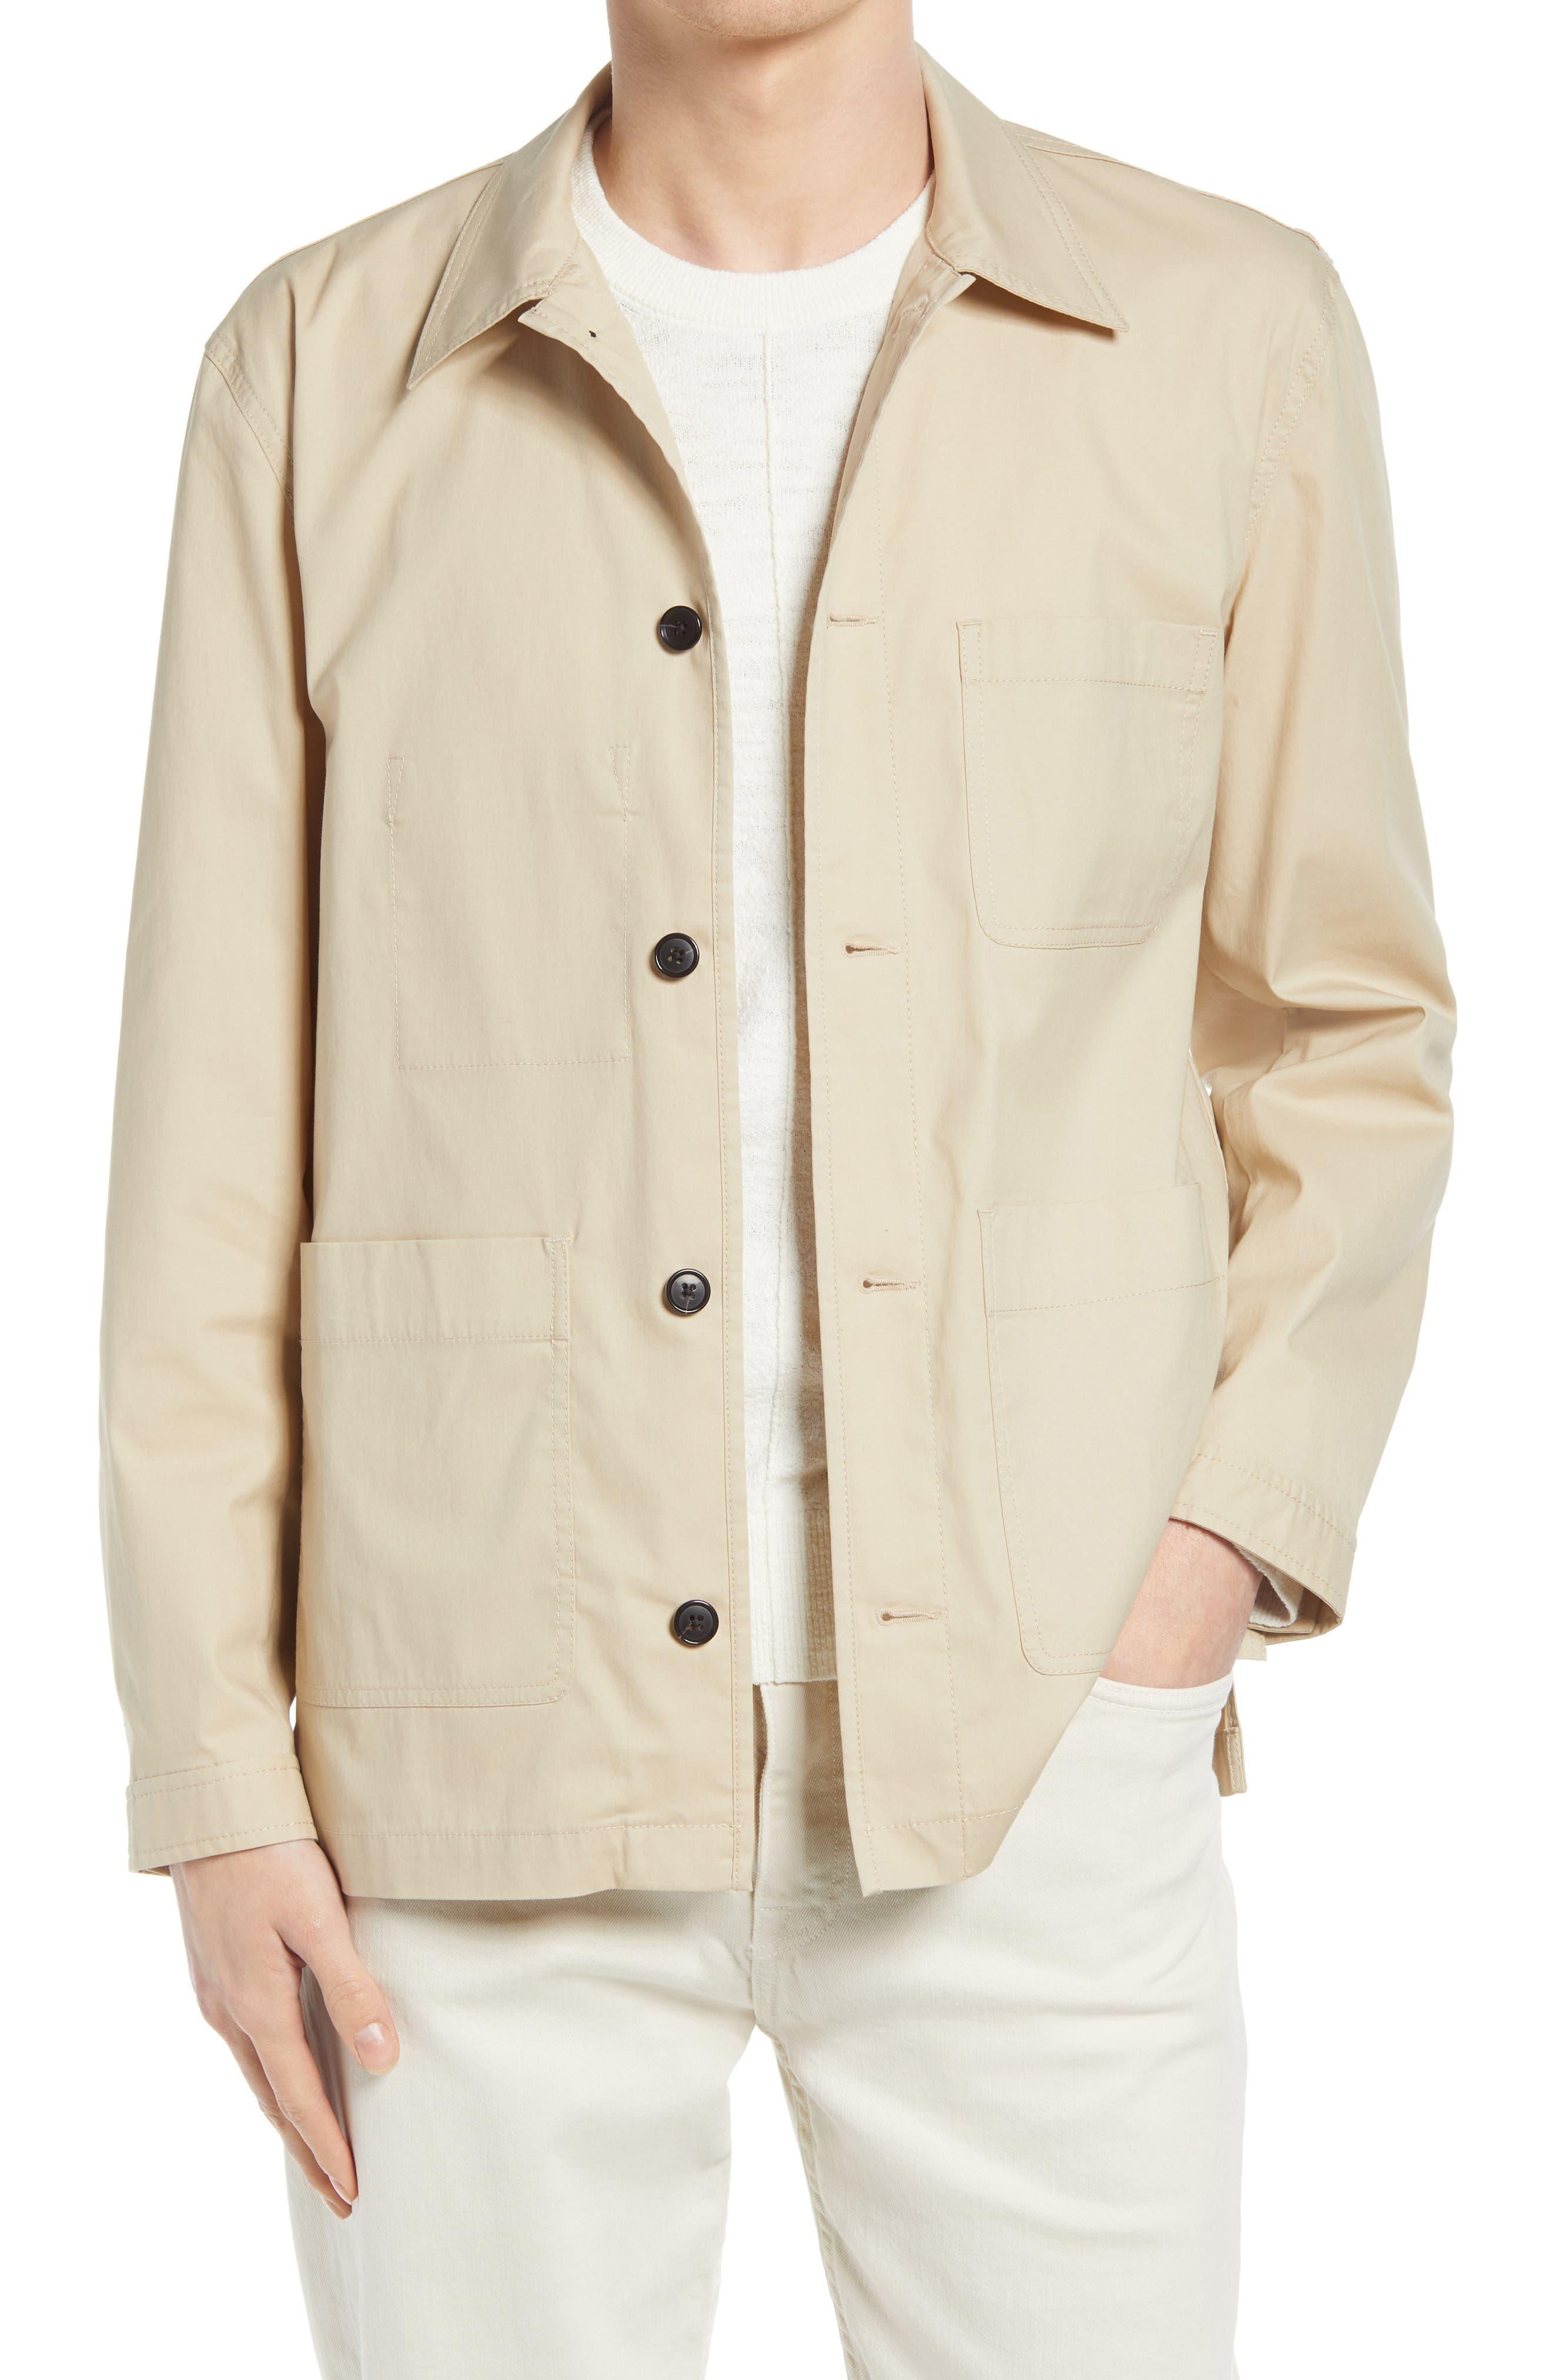 1920s Men's Workwear, Casual Clothes Mens Club Monaco Workwear Cotton Blend Jacket Size Small - Beige $93.23 AT vintagedancer.com